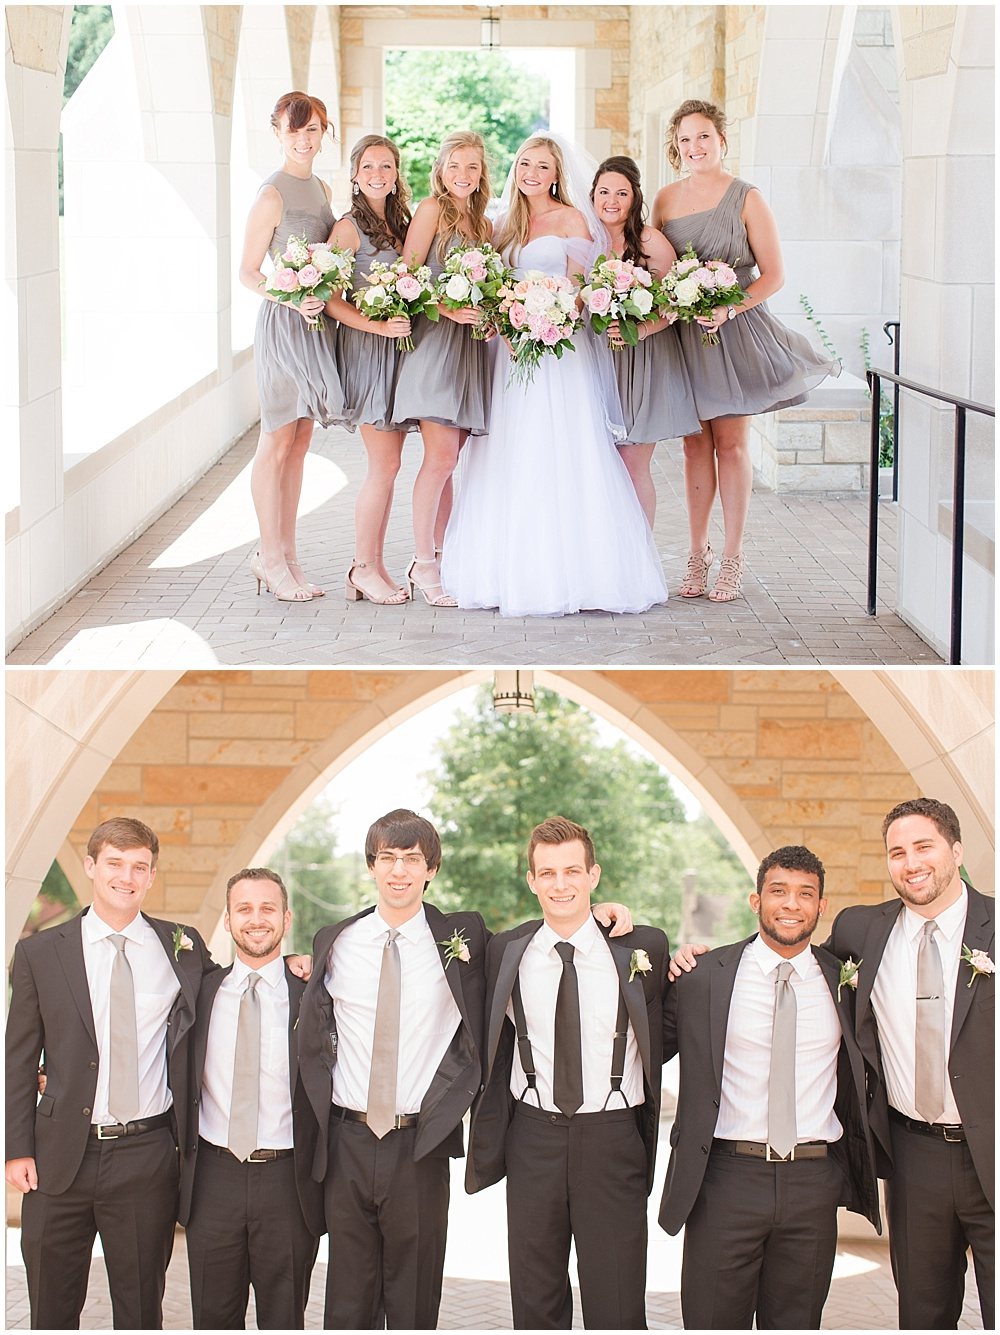 grey bridesmaid dresses; blush and white bridesmaid bouquets; st. paul's episcopal church   Sami Renee Photography   Jessica Dum Wedding Coordination